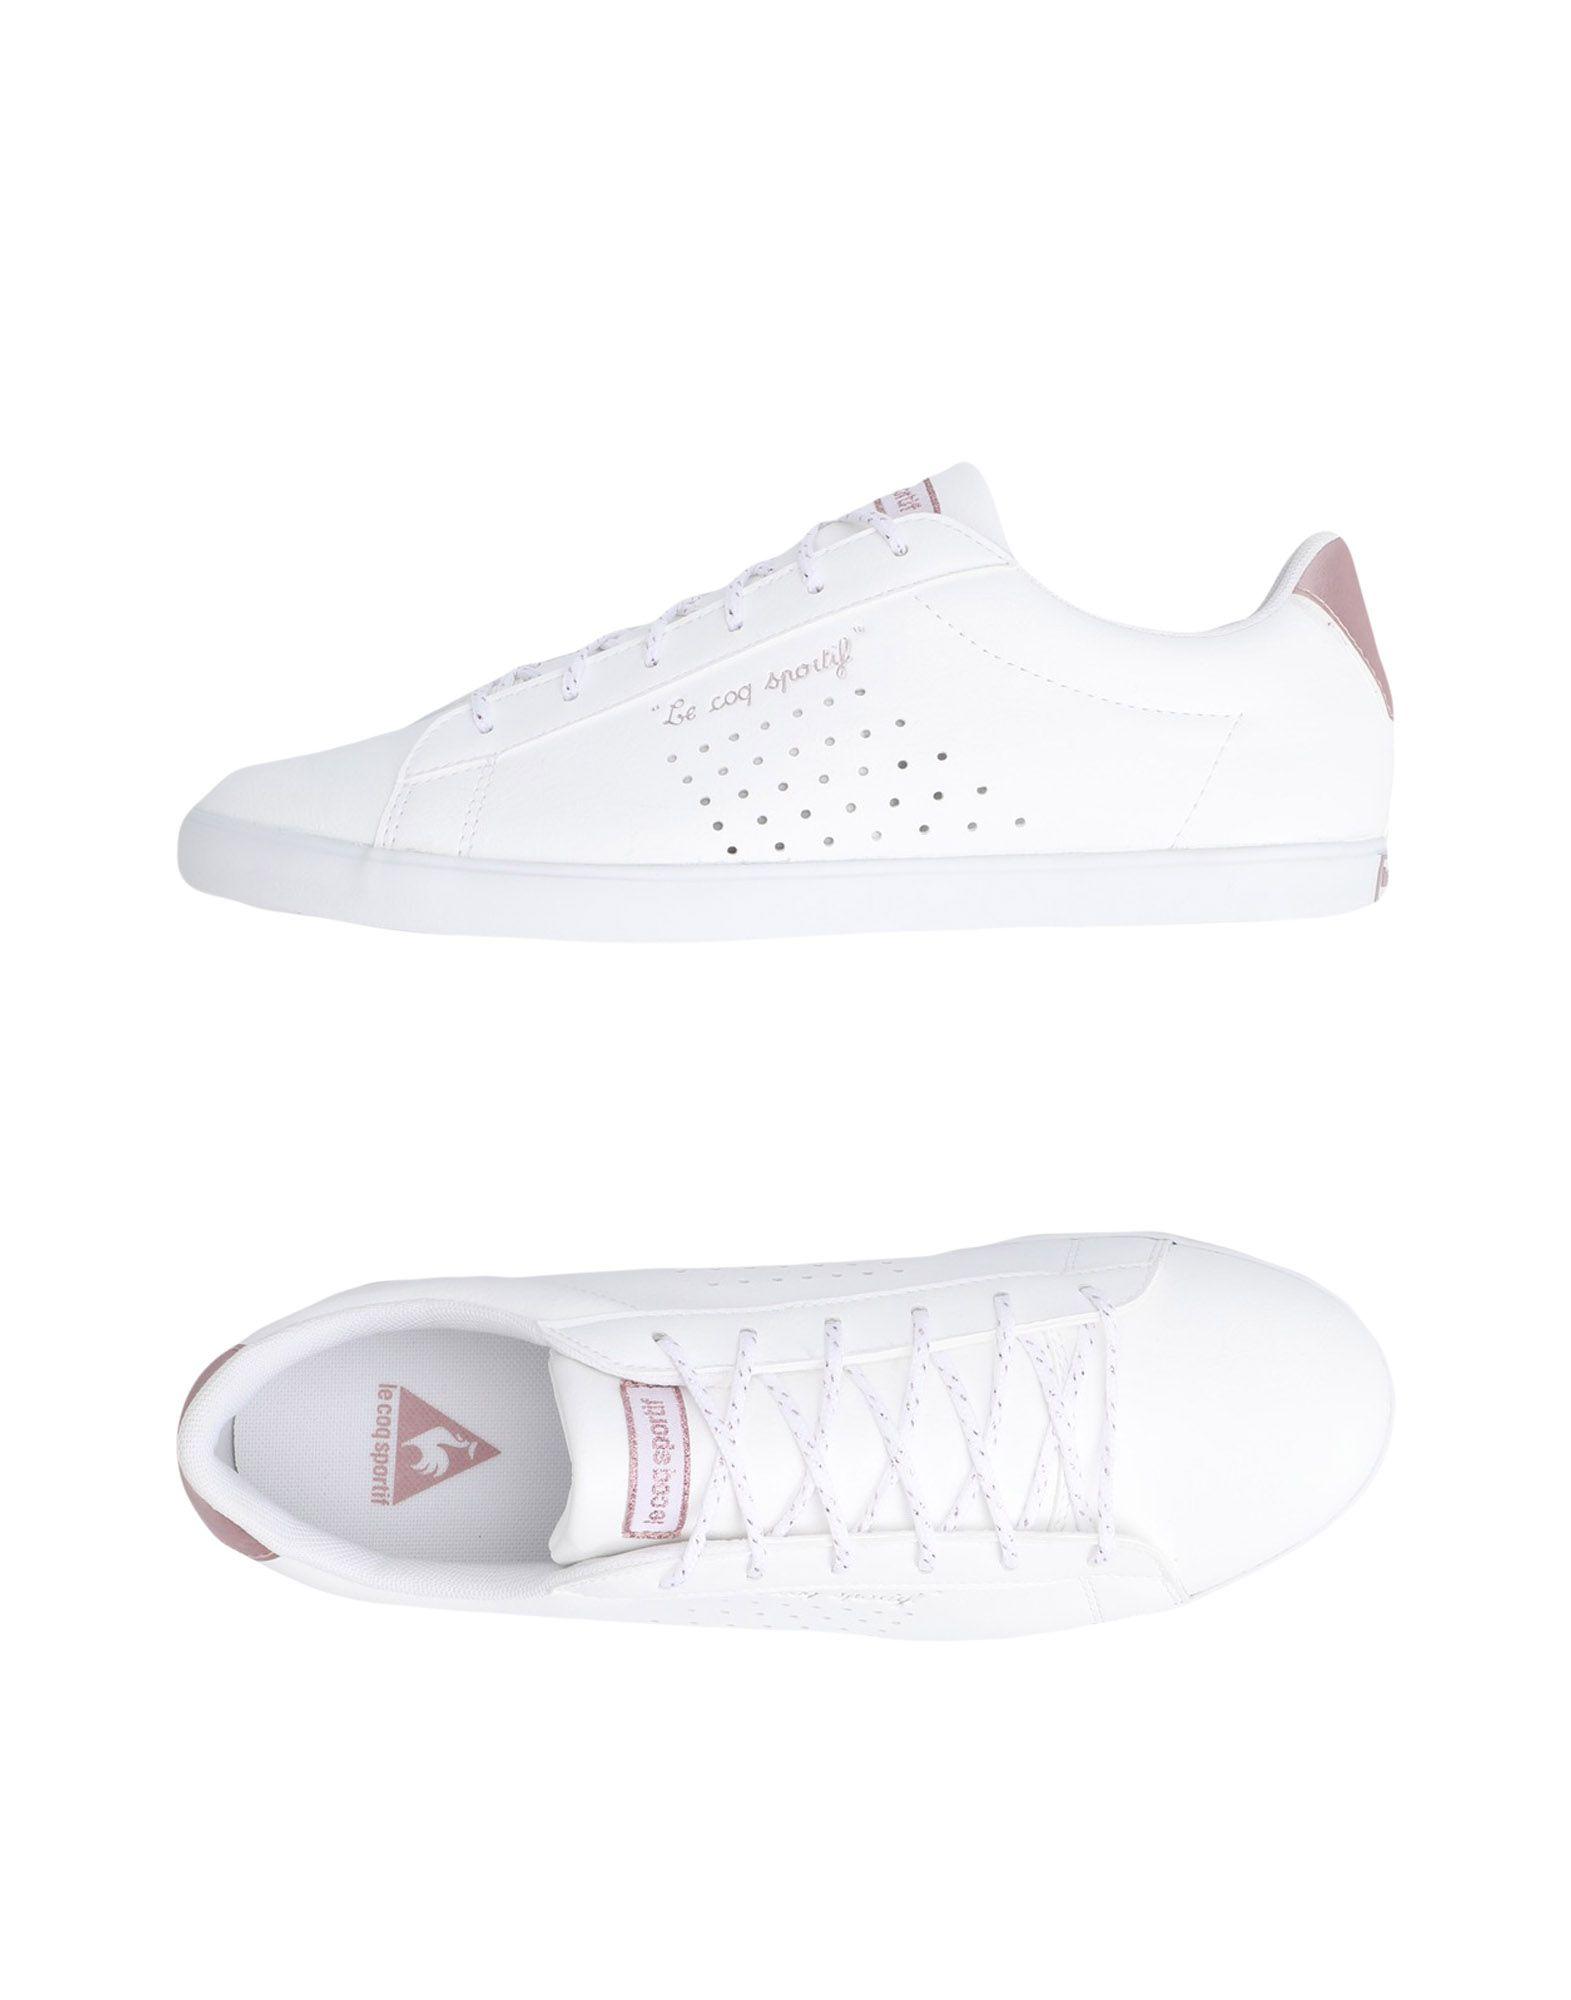 Sneakers Le Coq Sportif Agate Lo S Lea/Metallic - Femme - Sneakers Le Coq Sportif sur